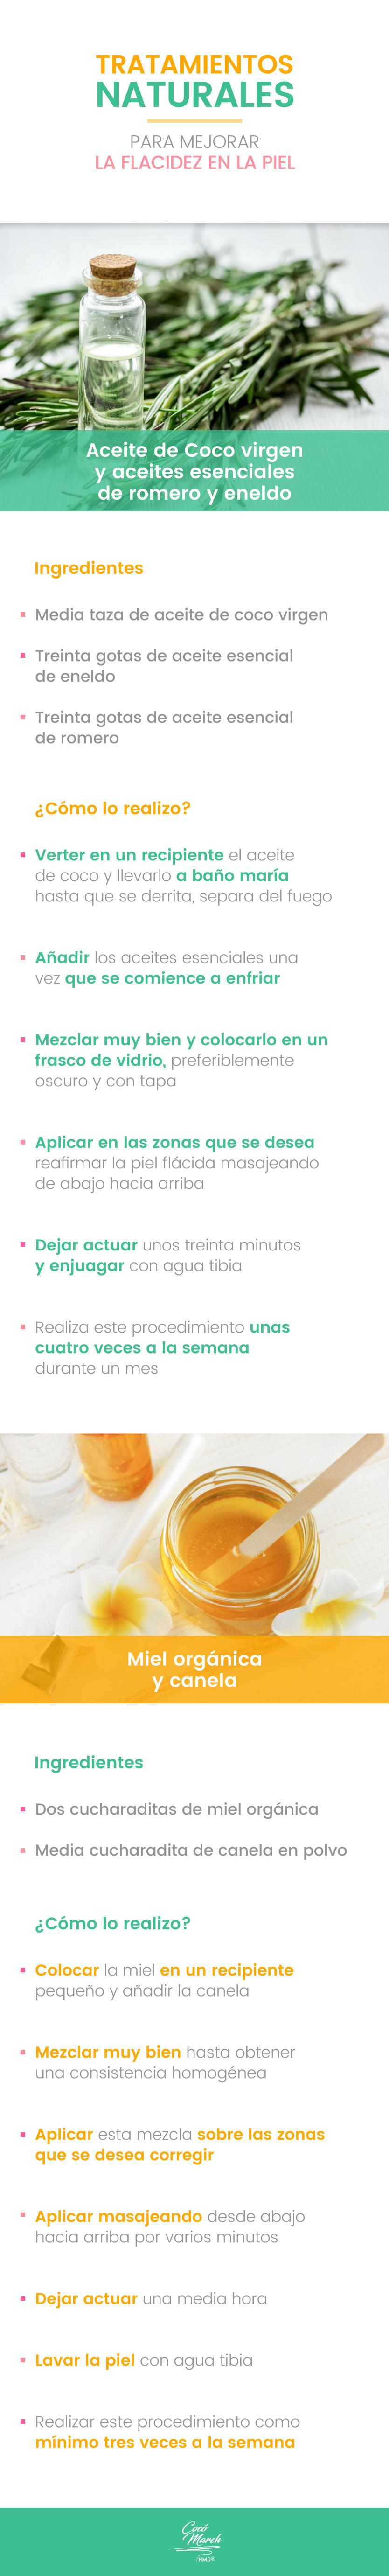 remedios-naturales-para-la-piel-flacida